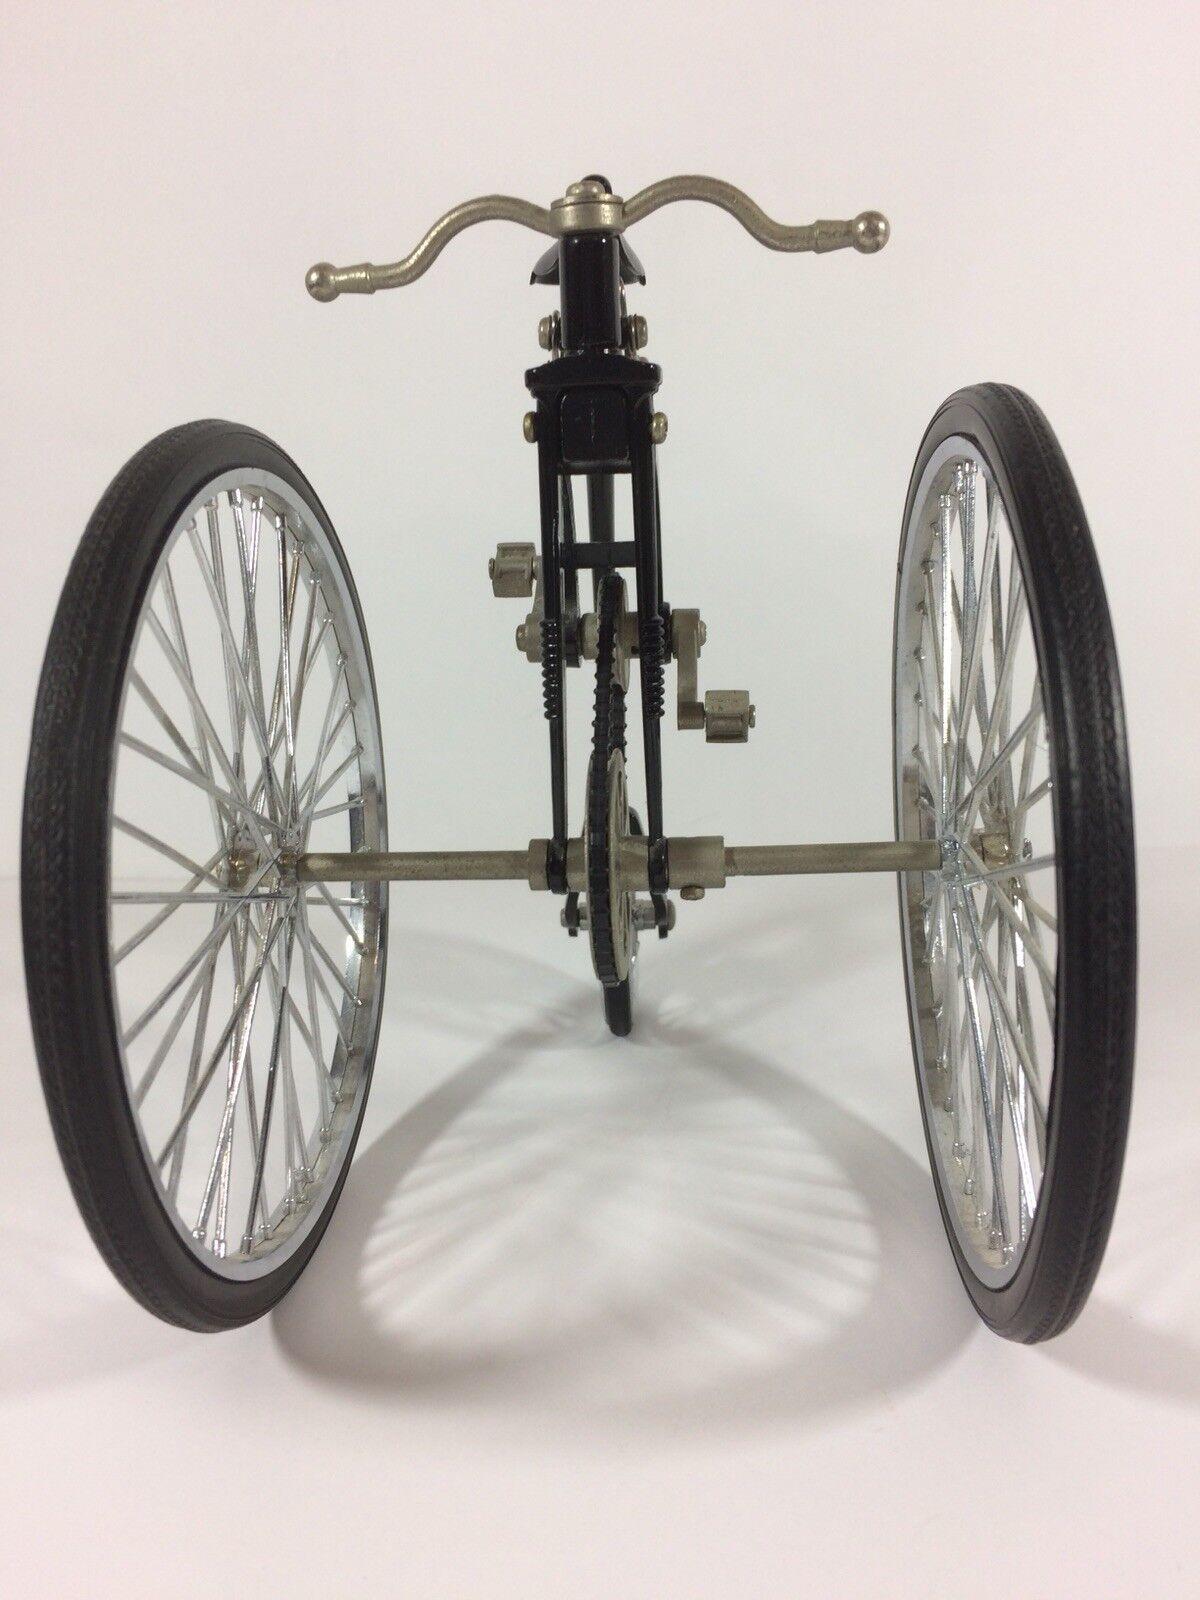 Dekorative miniatur sterben - mit penny farthings fahrrad.